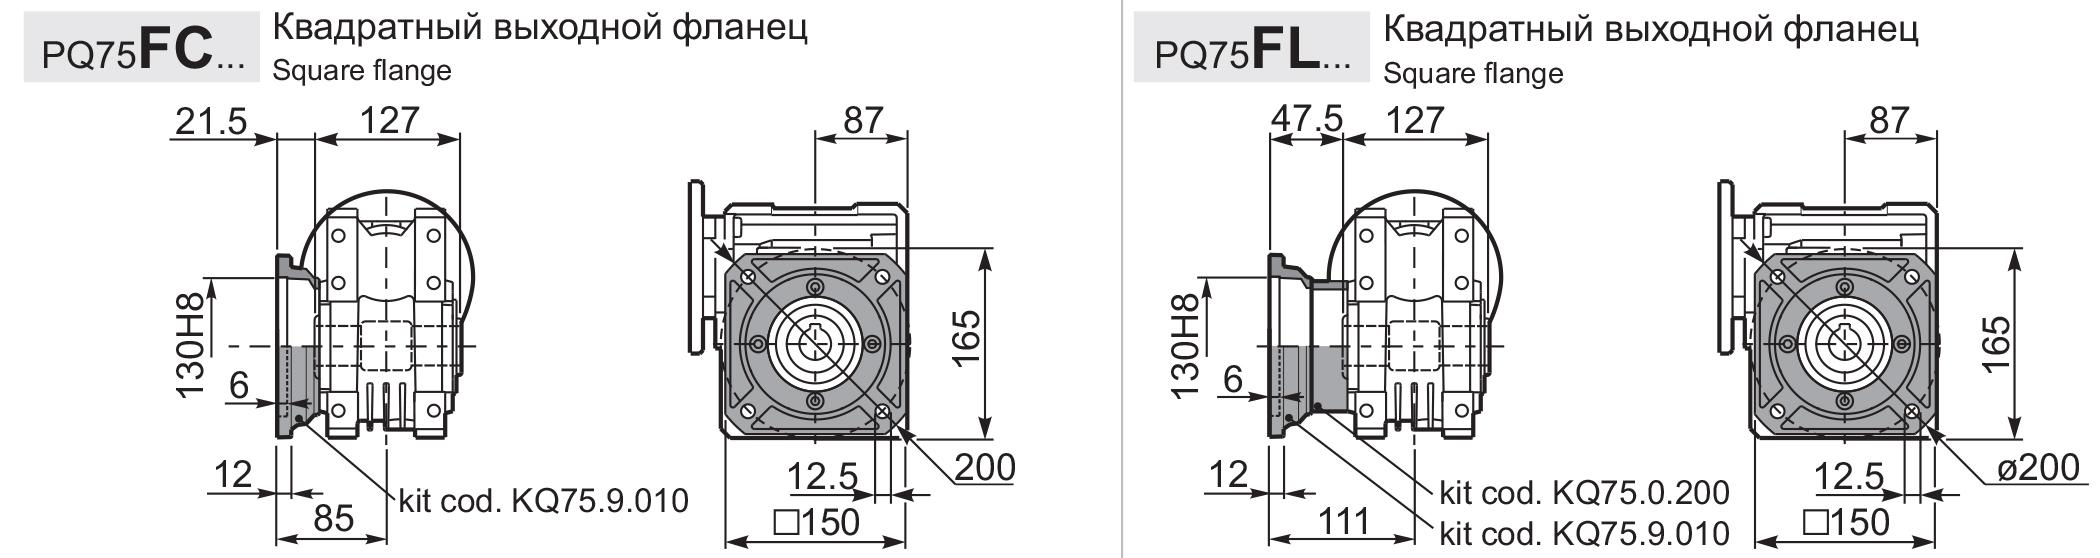 Чертеж редуктора Q 75 hydro-mec фланцы